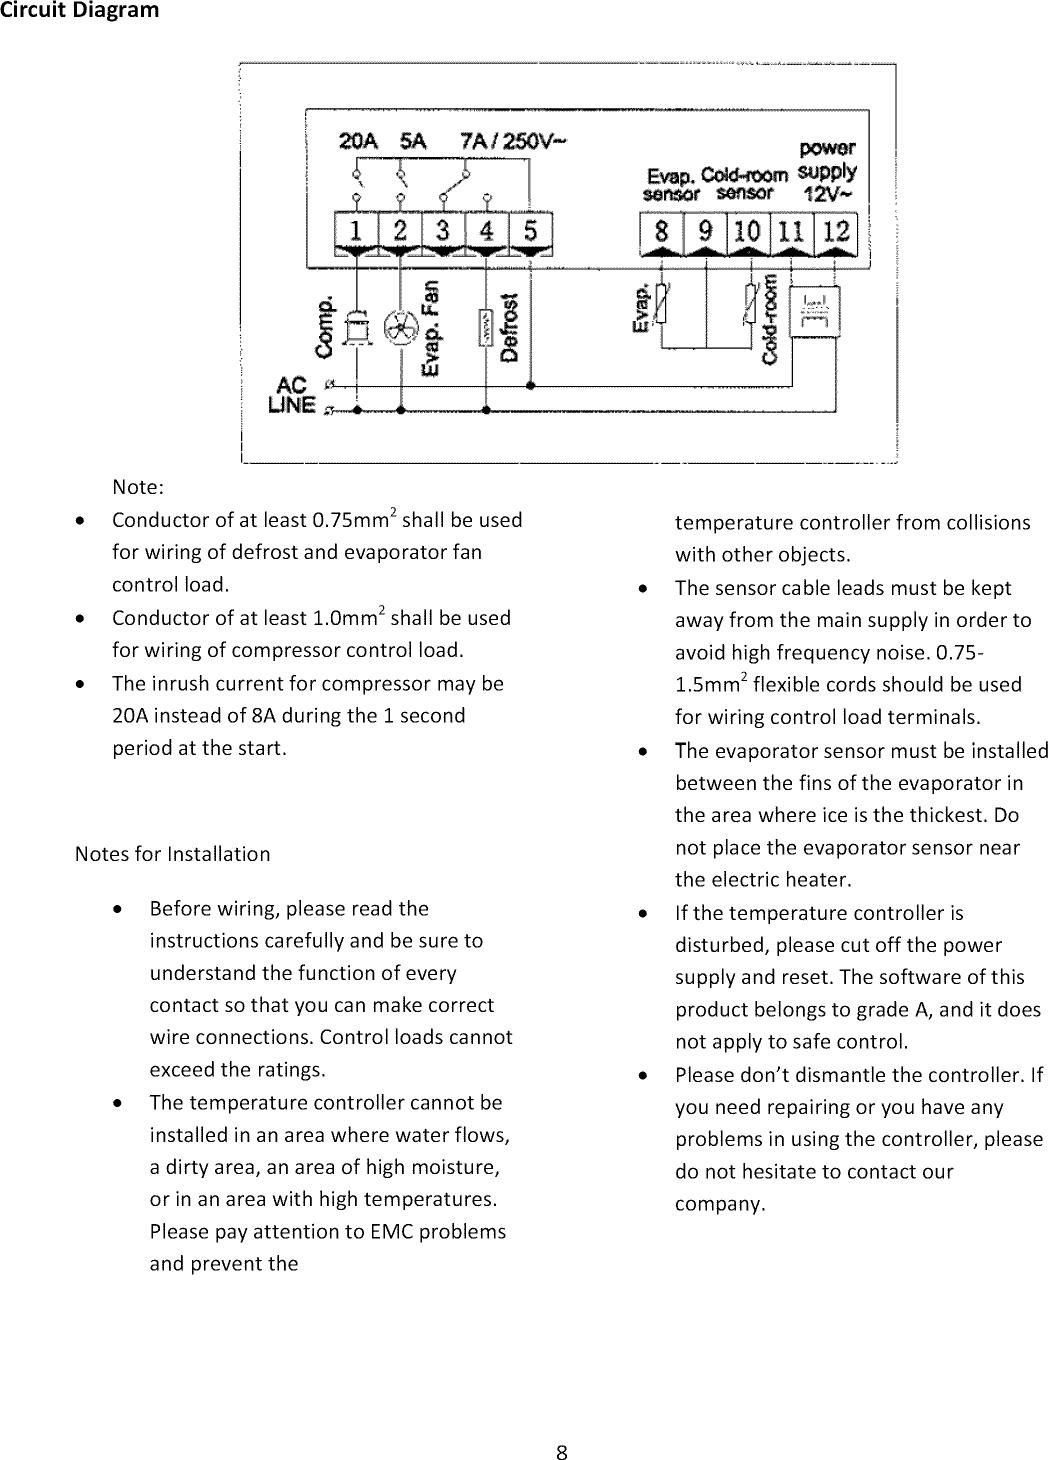 Kelvinator Kcgm10rb User Manual Glass Door Refrigerator Manuals And Range Wiring Diagram Page 8 Of 11 Guides